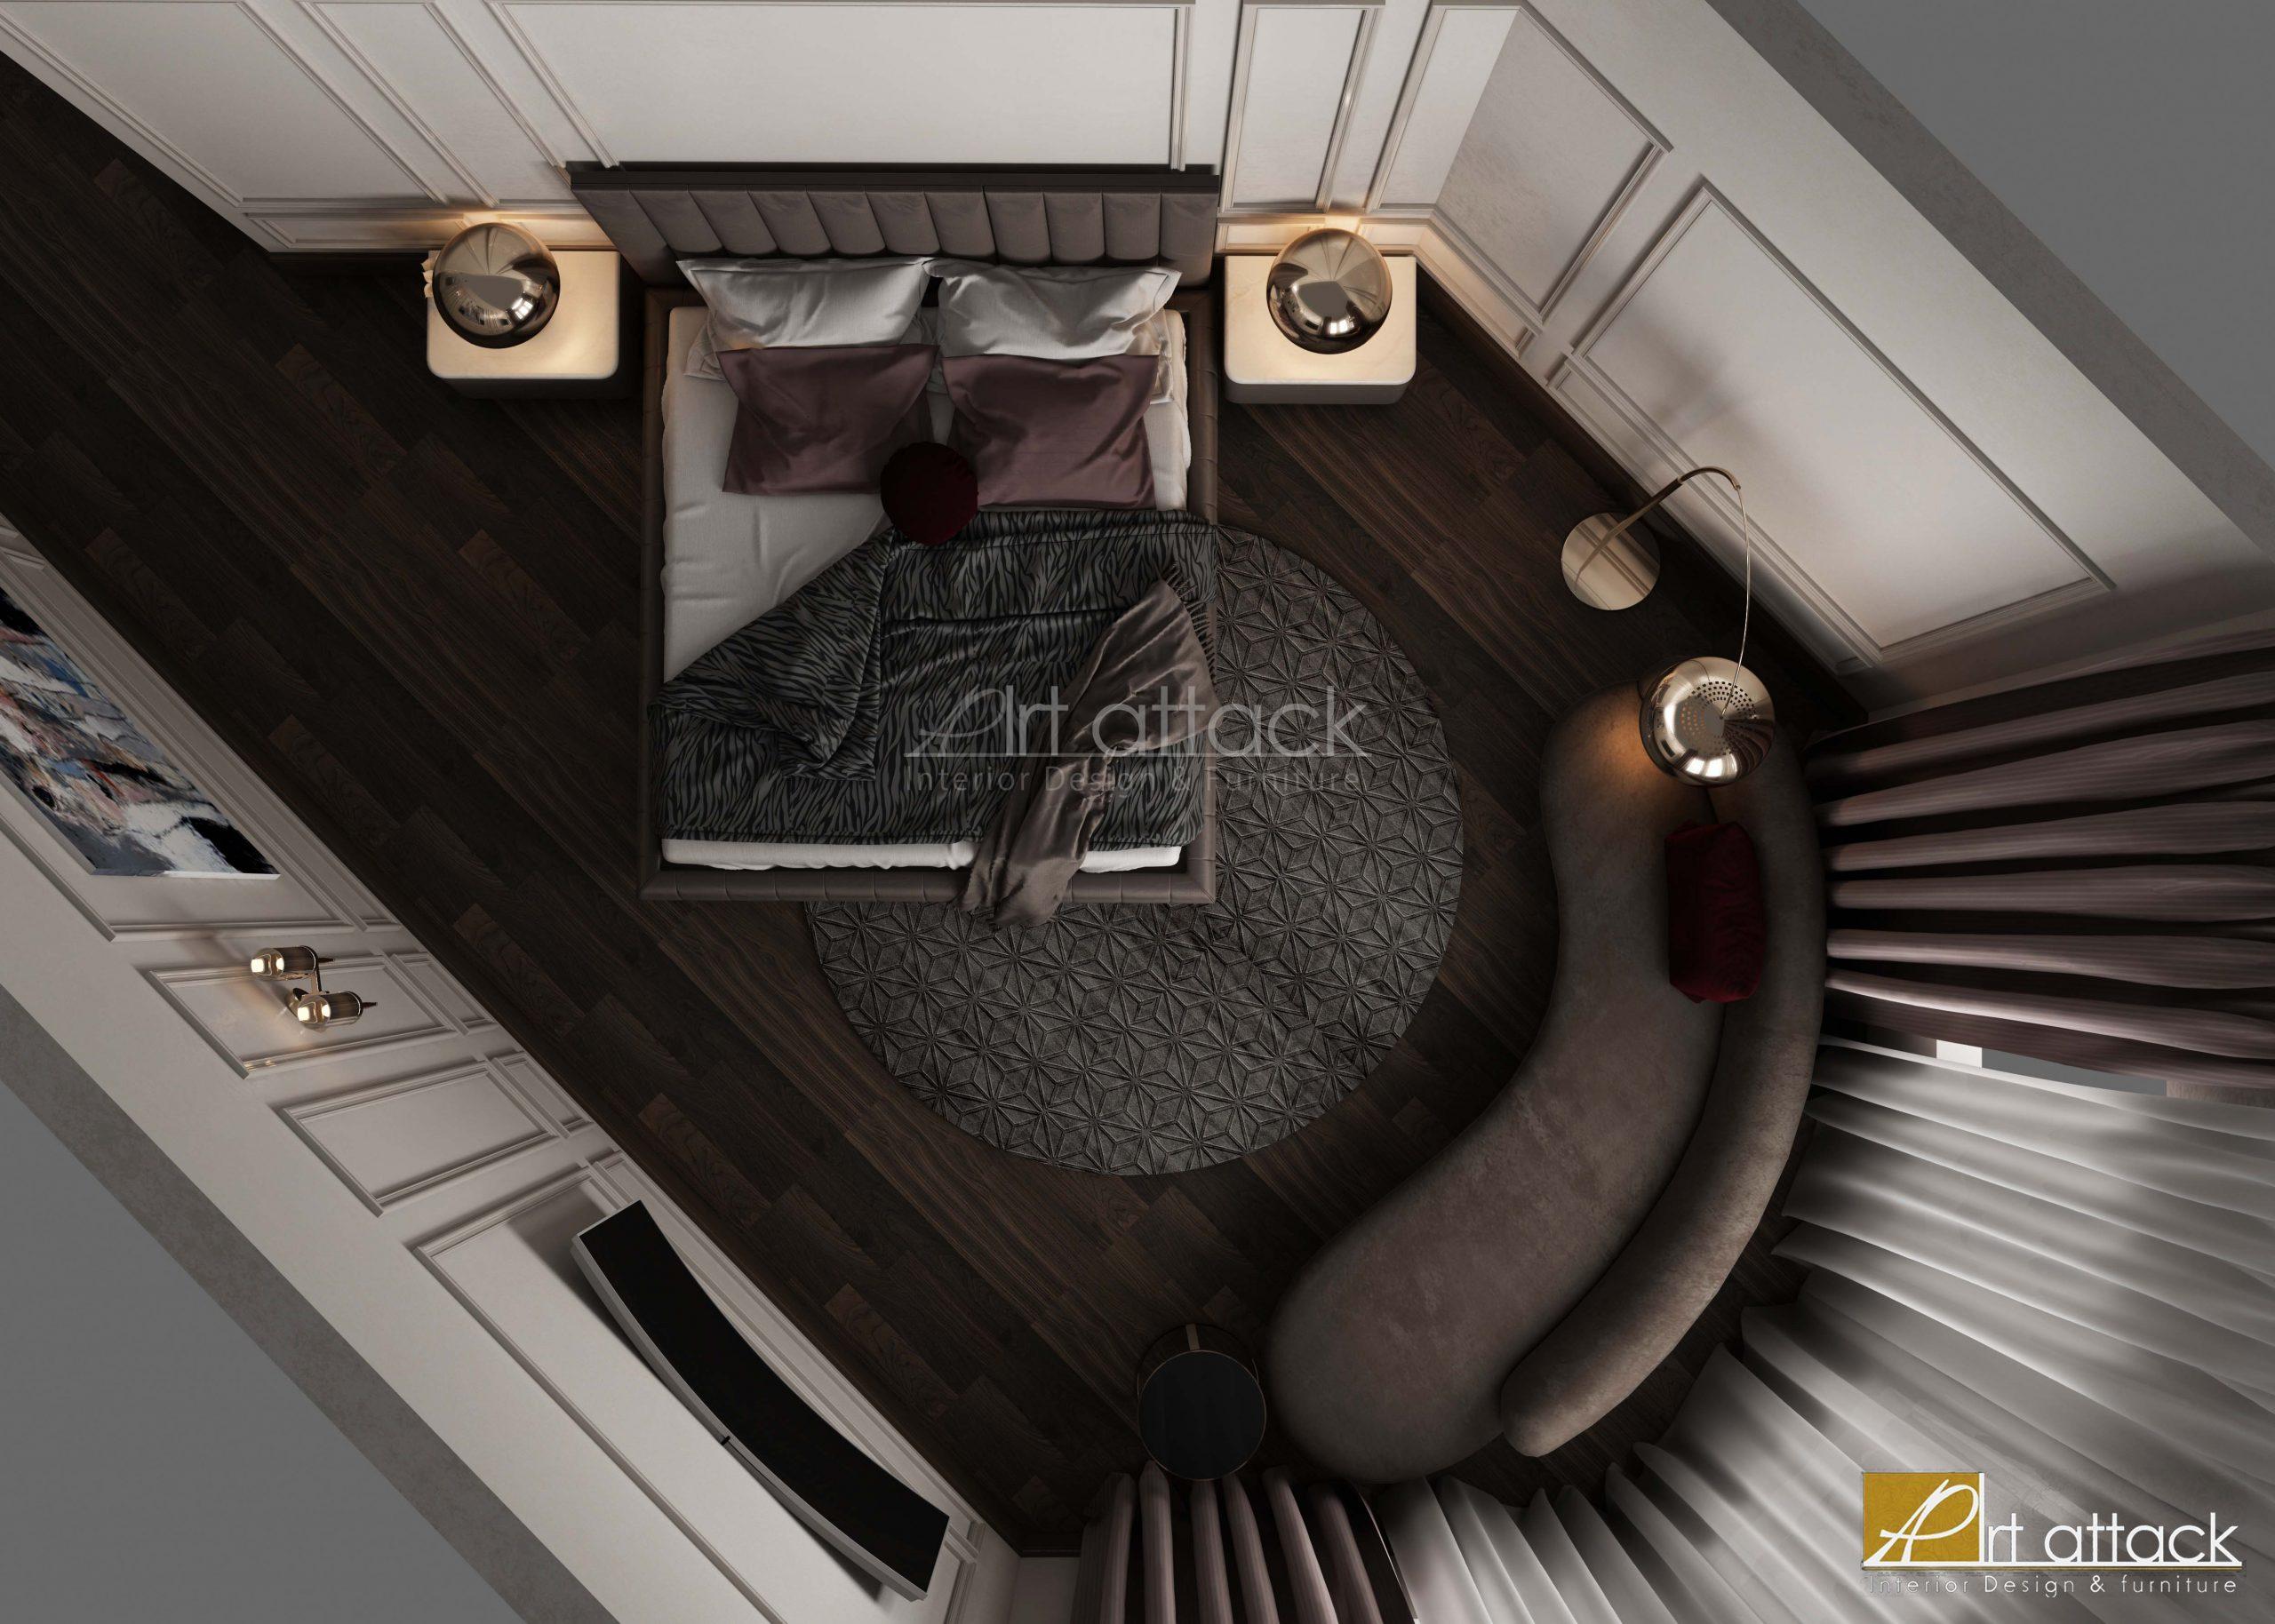 شركة-ديكور-بالقاهرةمصمم-ديكور-بالقاهرةشركة-ديكور-بالتجمعتصميم-غرف-نوم-صغيرة-interiordesigndecorationdesigndecorexteriordesignmodernclassicmodernclassicjpg-scaled